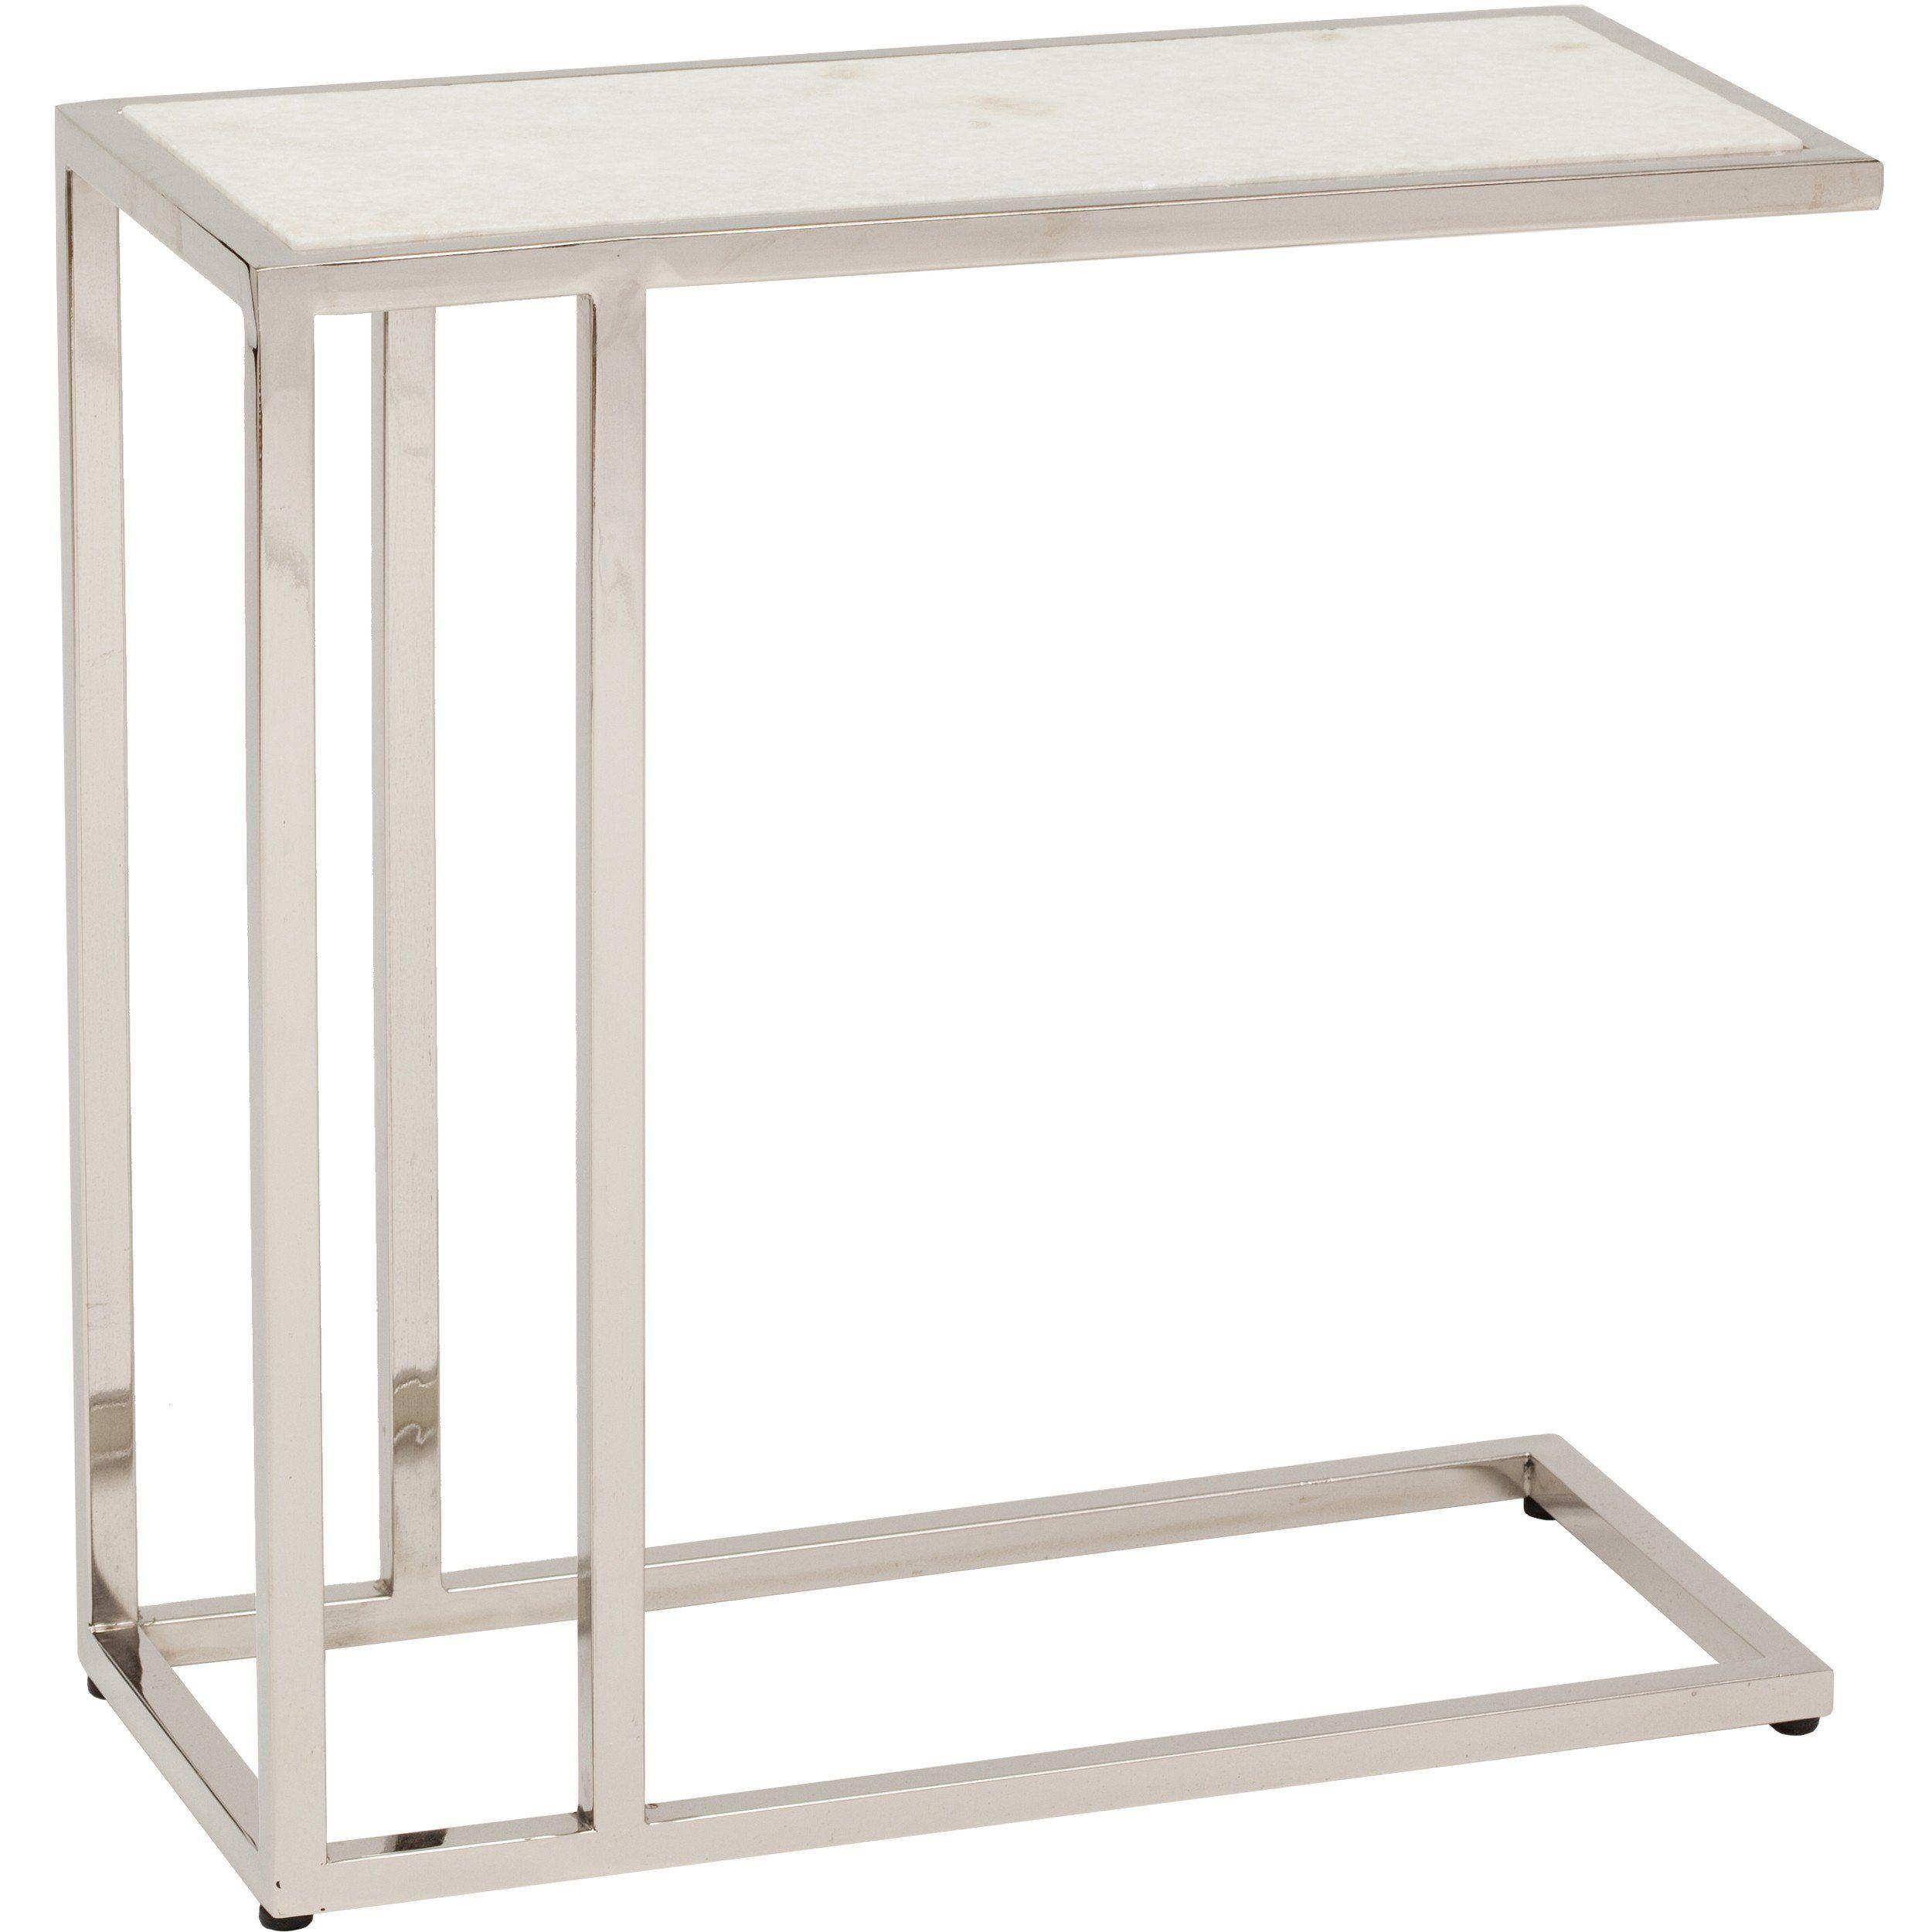 Furniture Echelon Tables